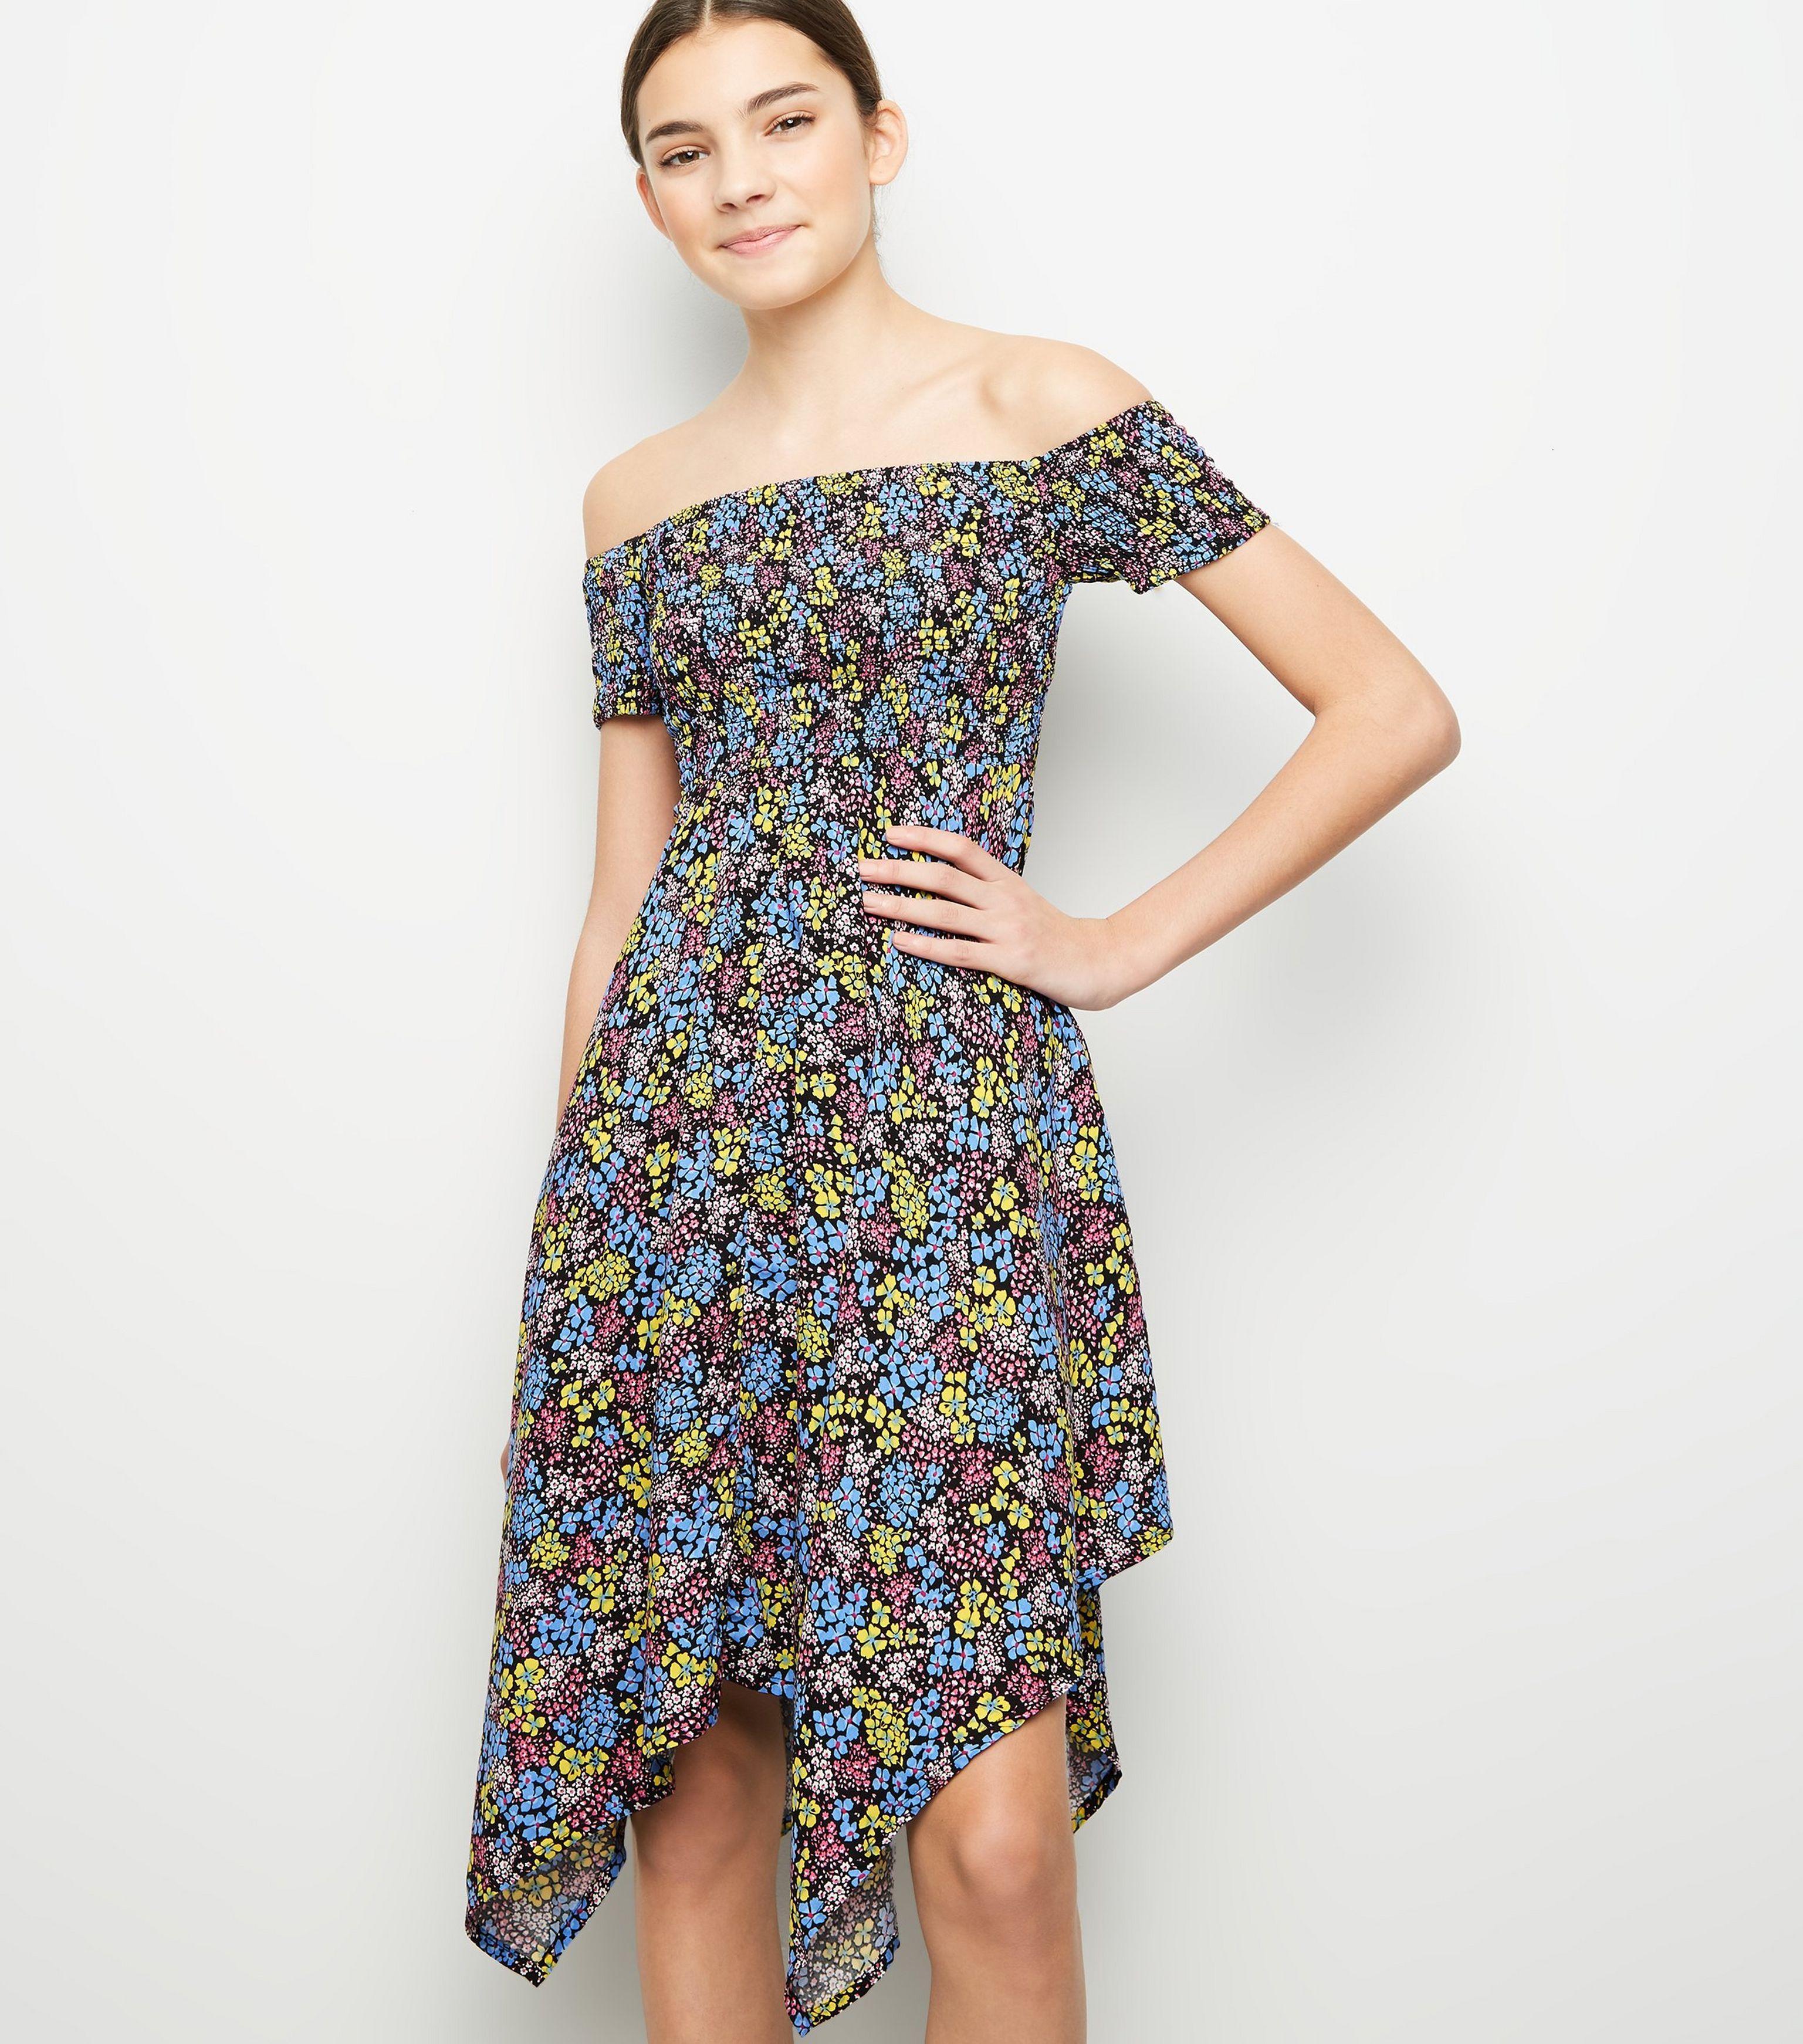 3b0916f7d4c2 New Look Girls Black Floral Shirred Hanky Hem Dress in Black - Lyst